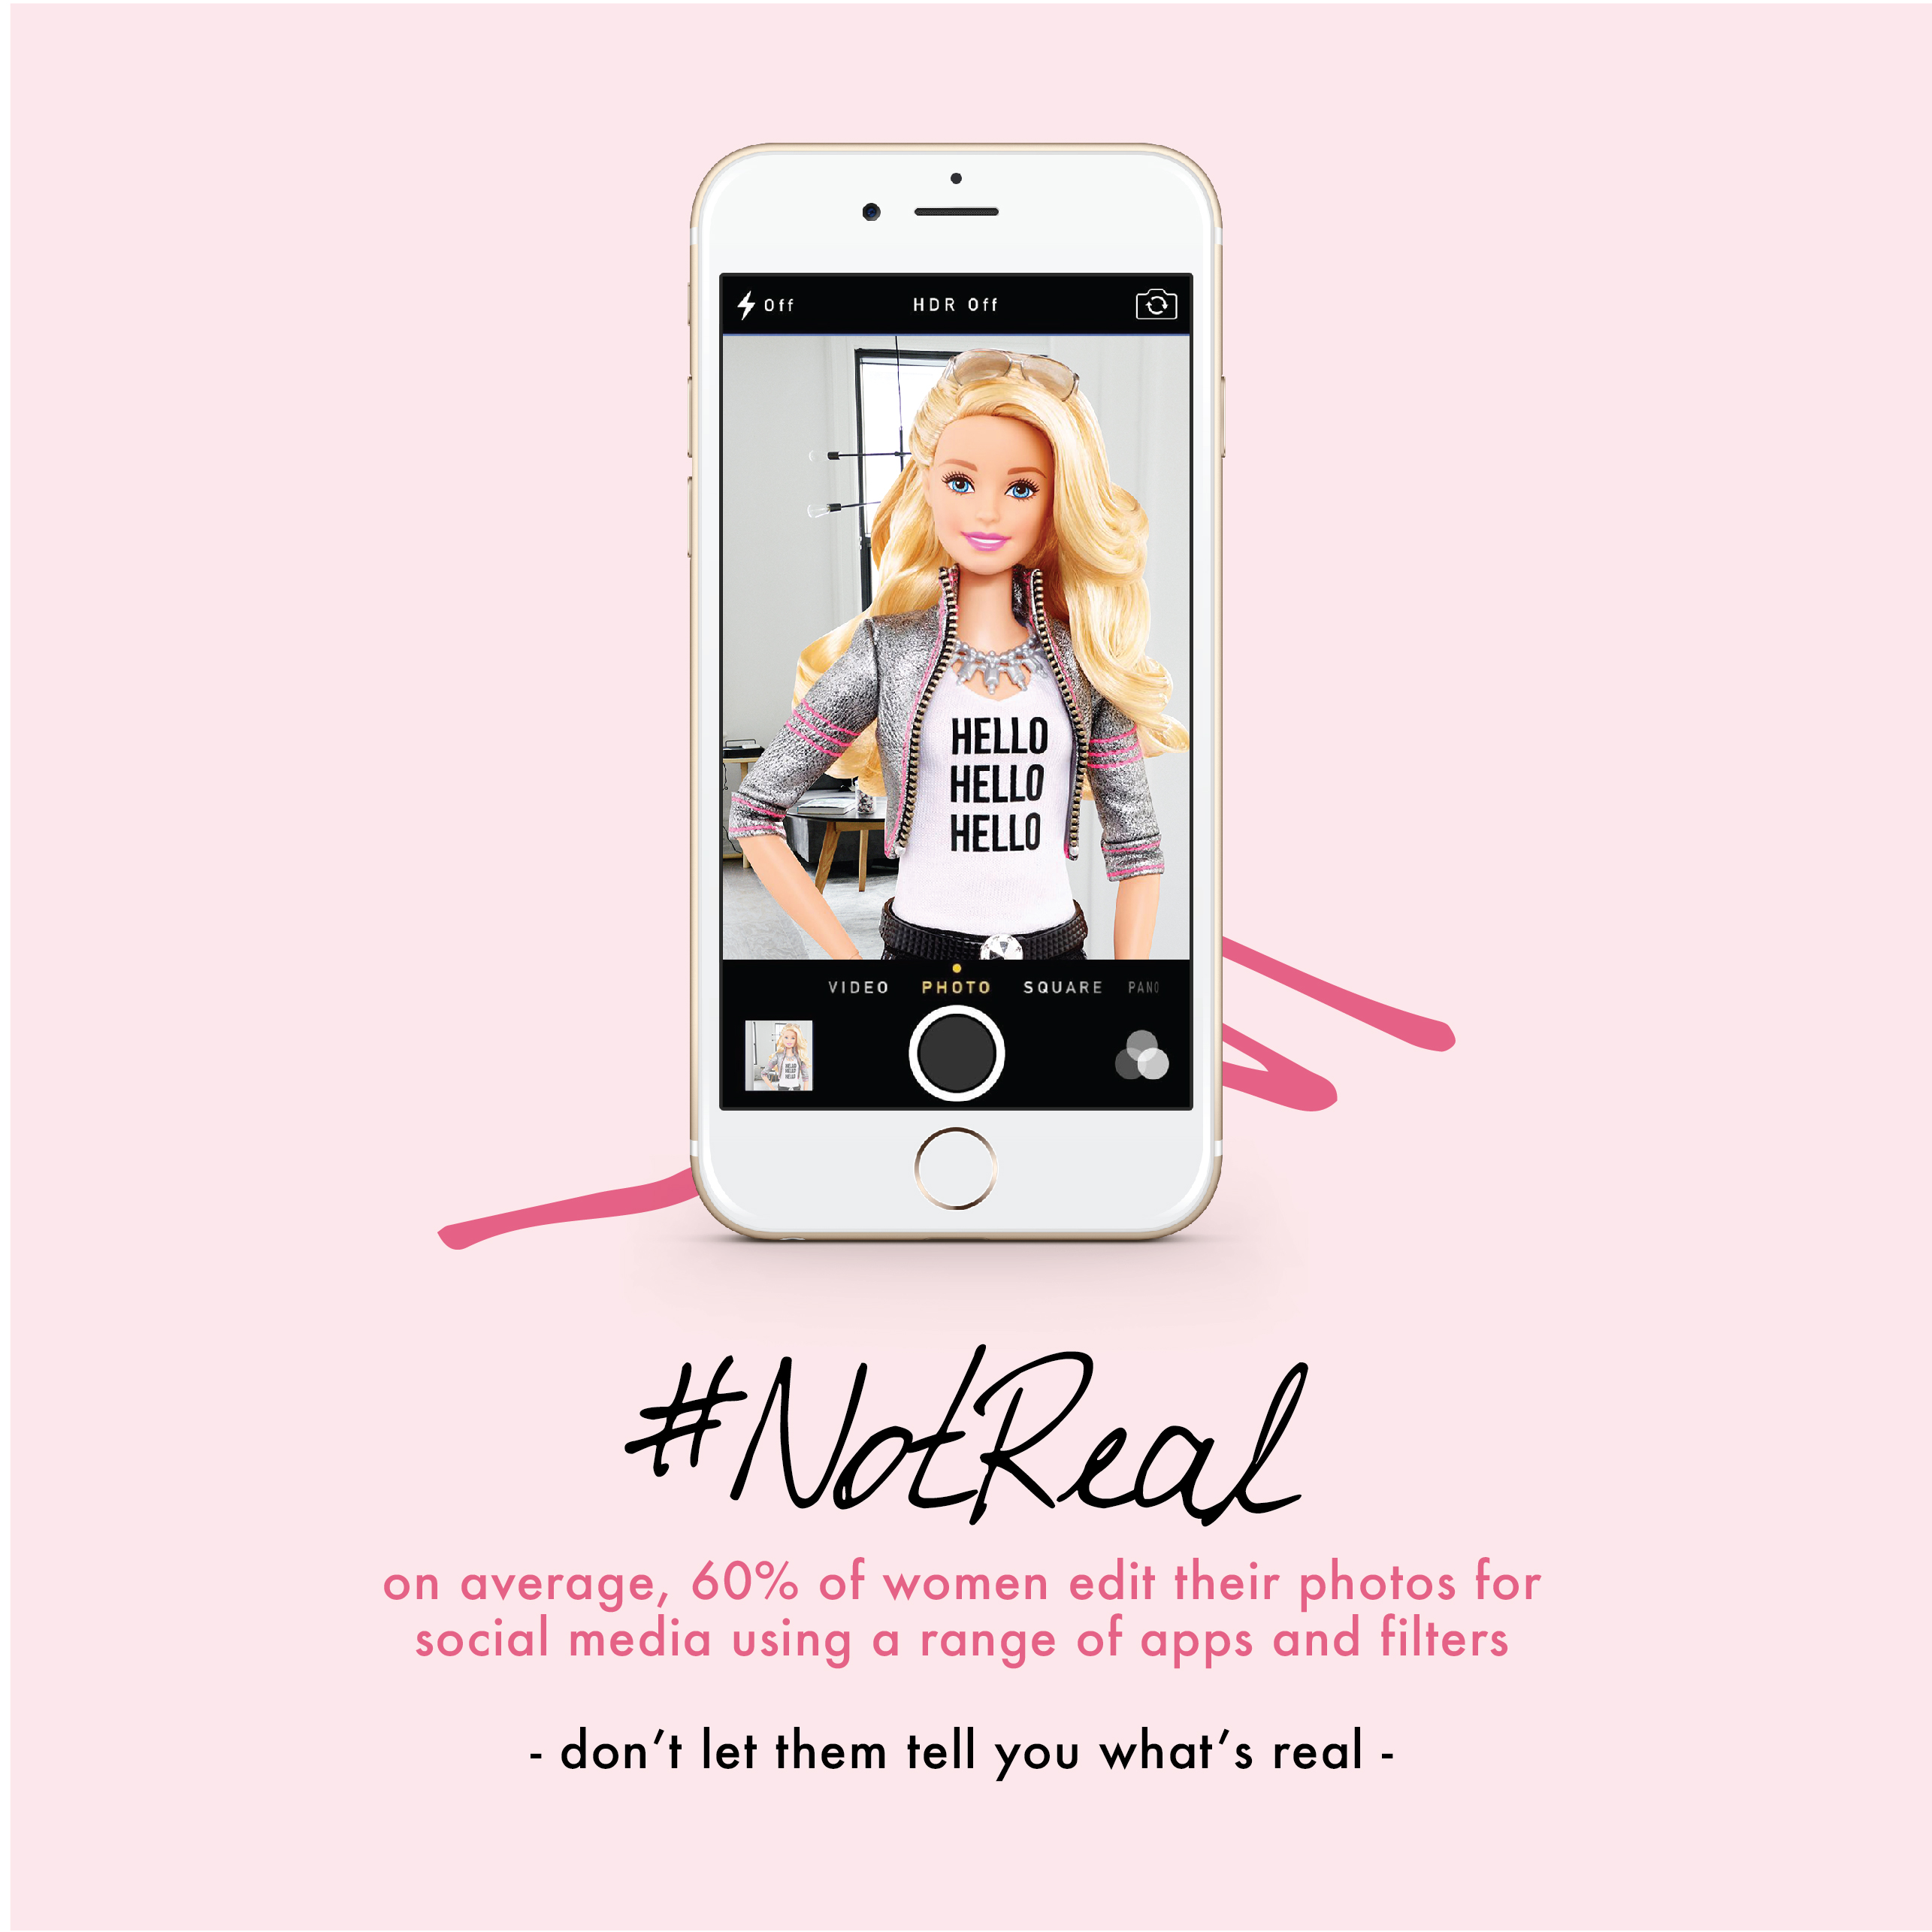 barbie-social-media-campaign-instagram-02